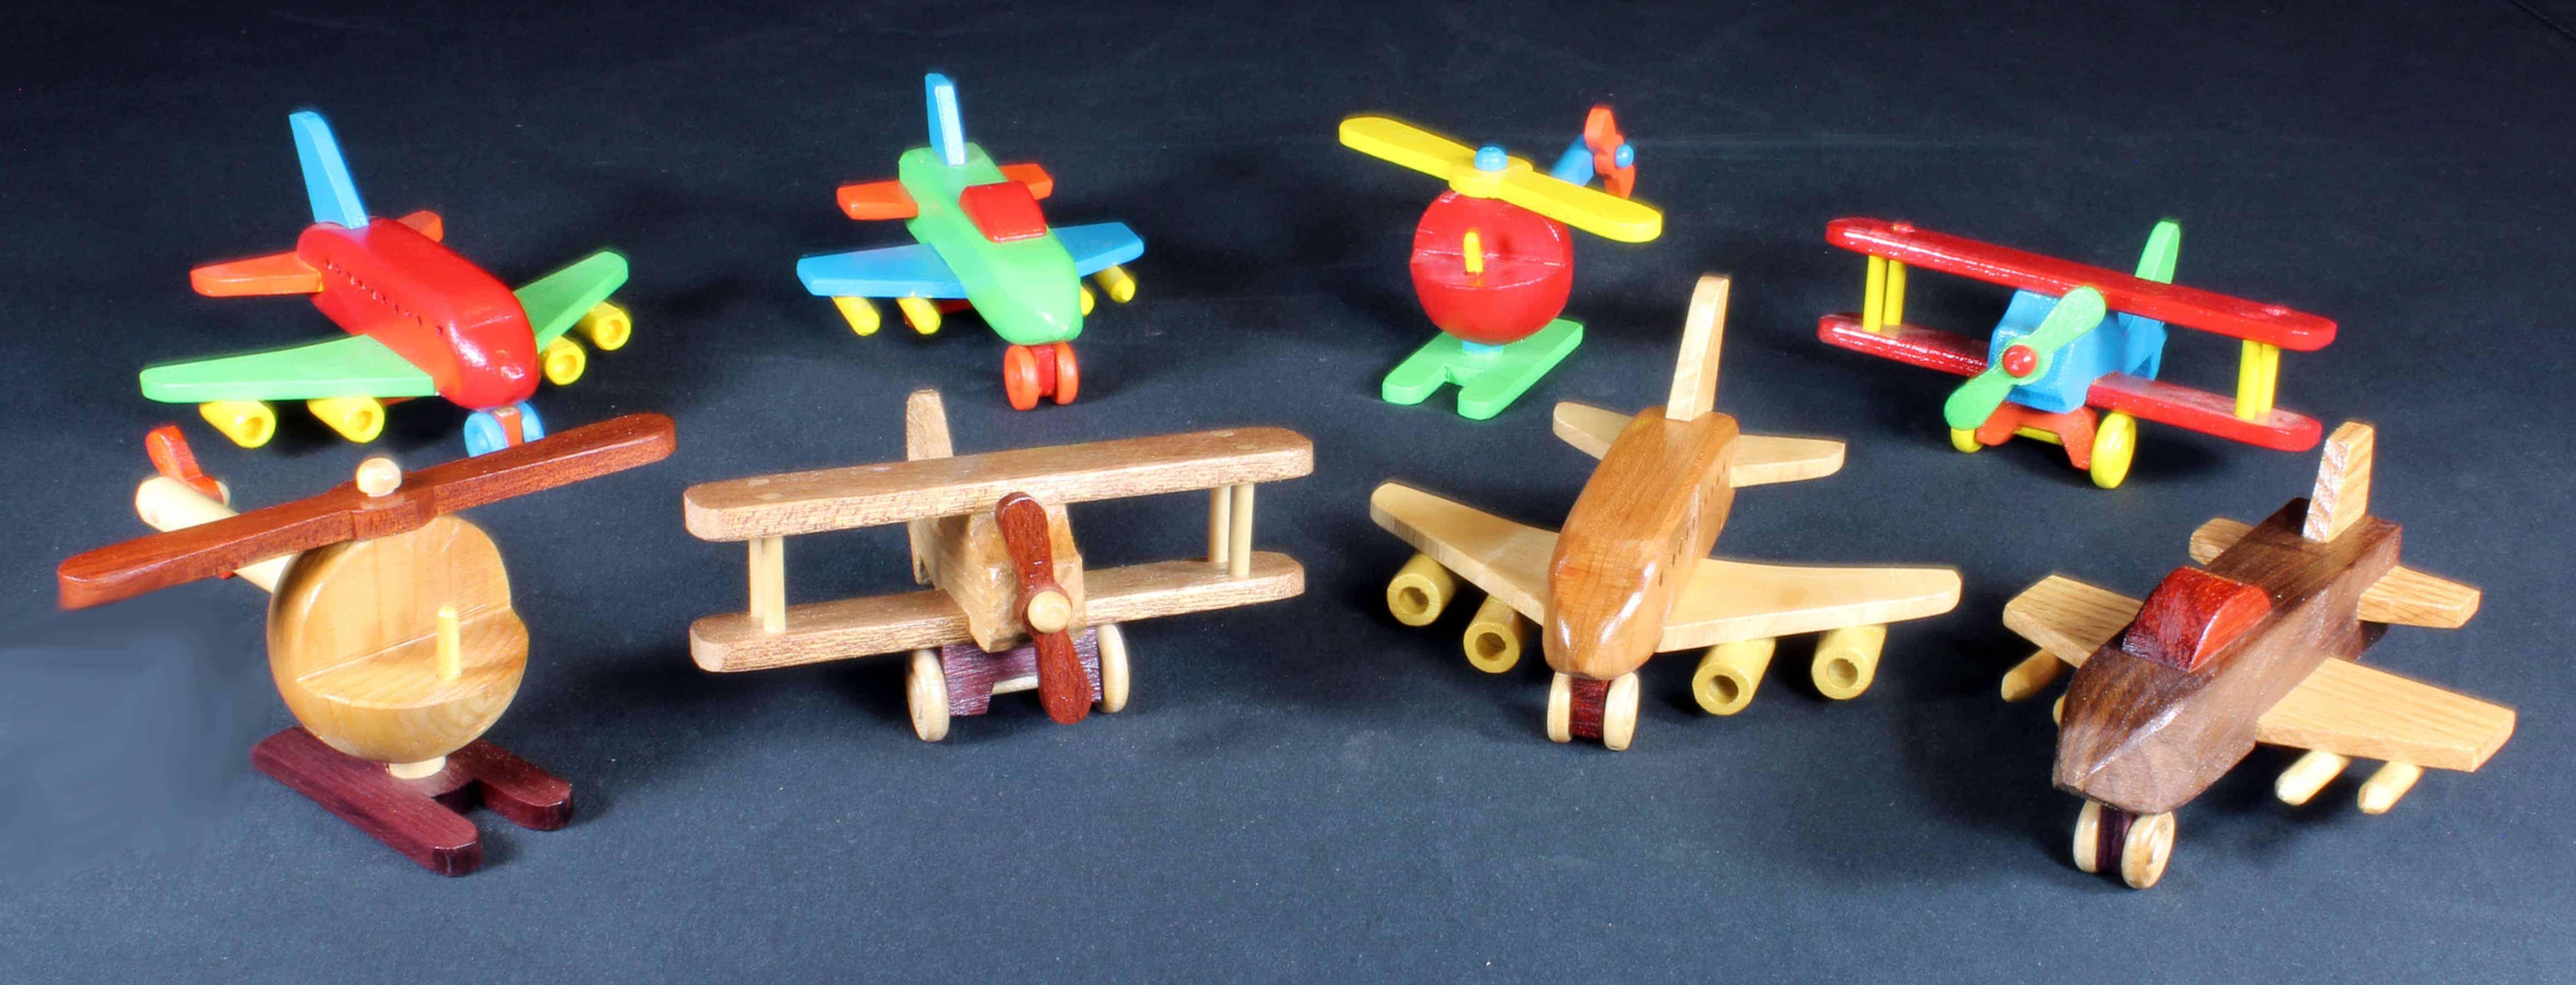 Plump'N'Tuff airplane woodworking plans